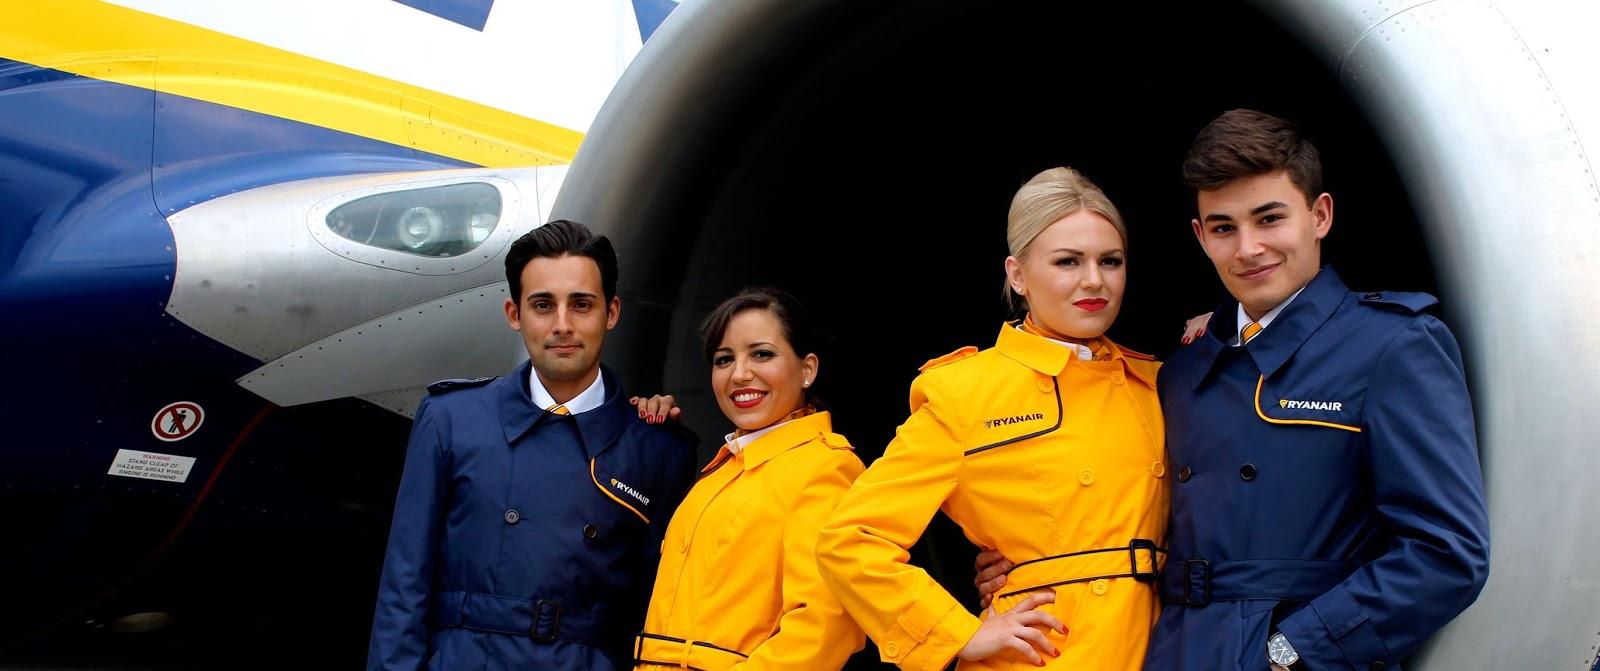 Ryanair Cabin Crew – Ryanair Careers - Hospitality Job4u